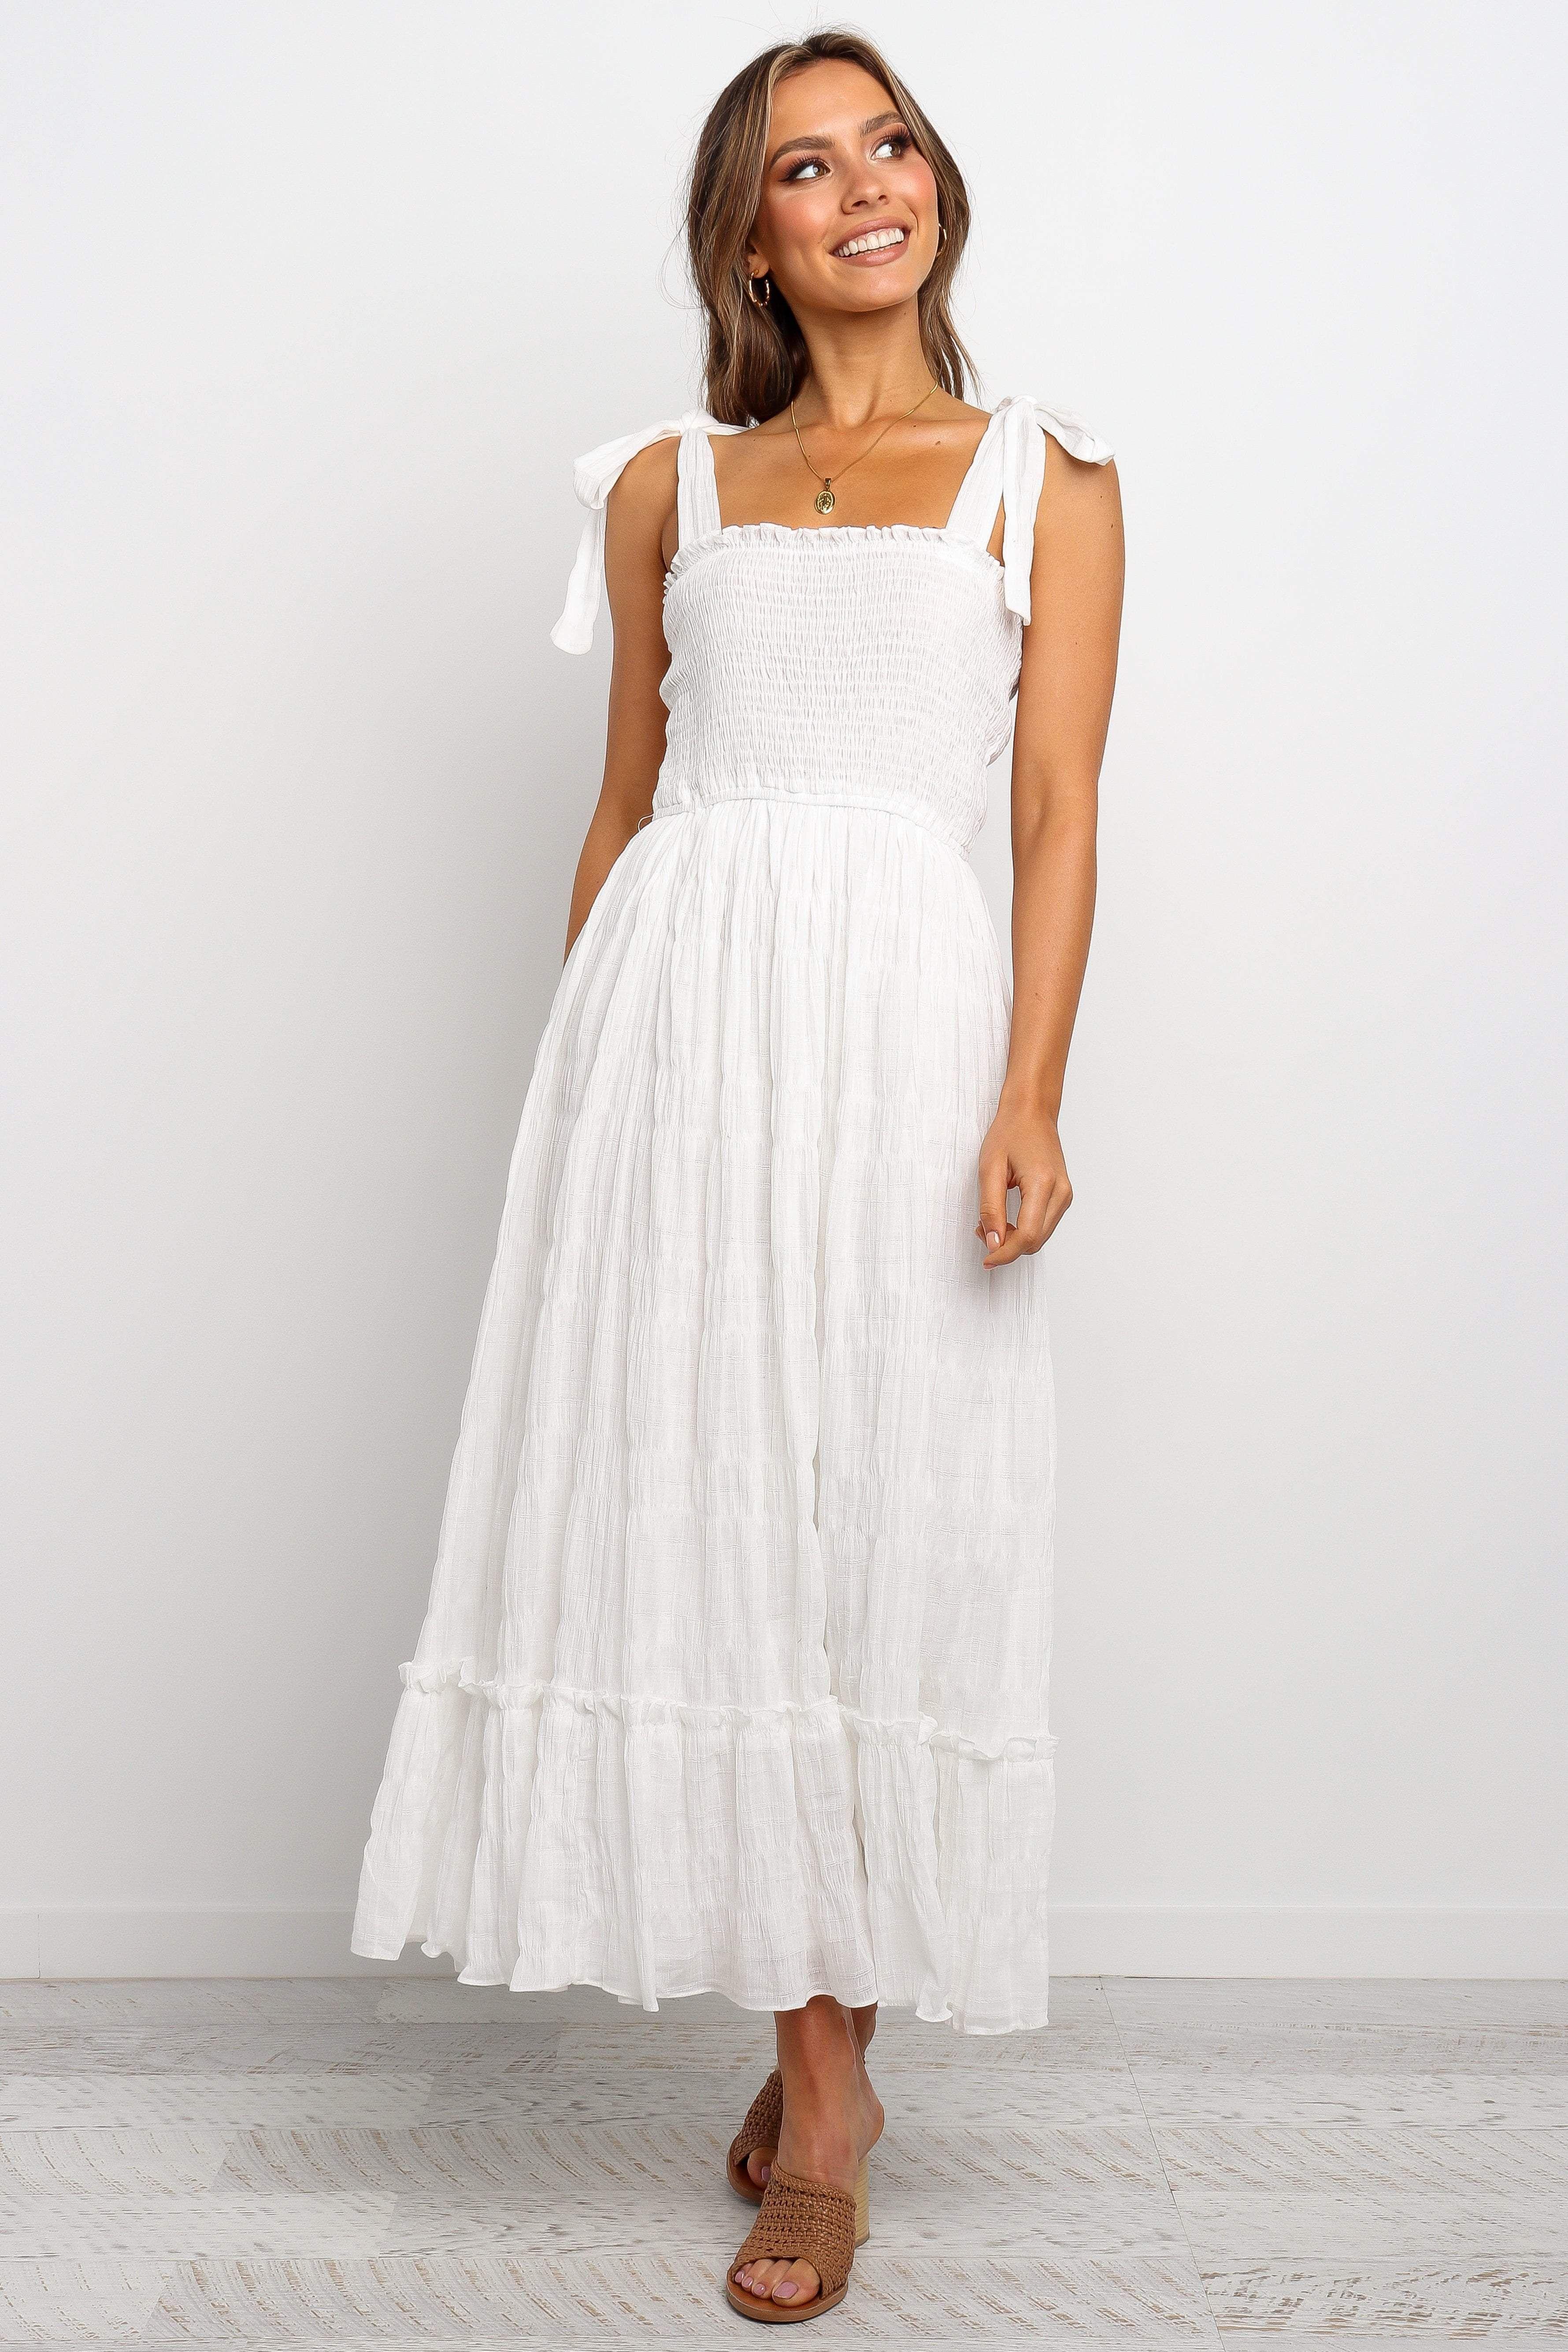 Janie Dress White M Casual White Dress White Dress Elven Dress [ 5338 x 3559 Pixel ]